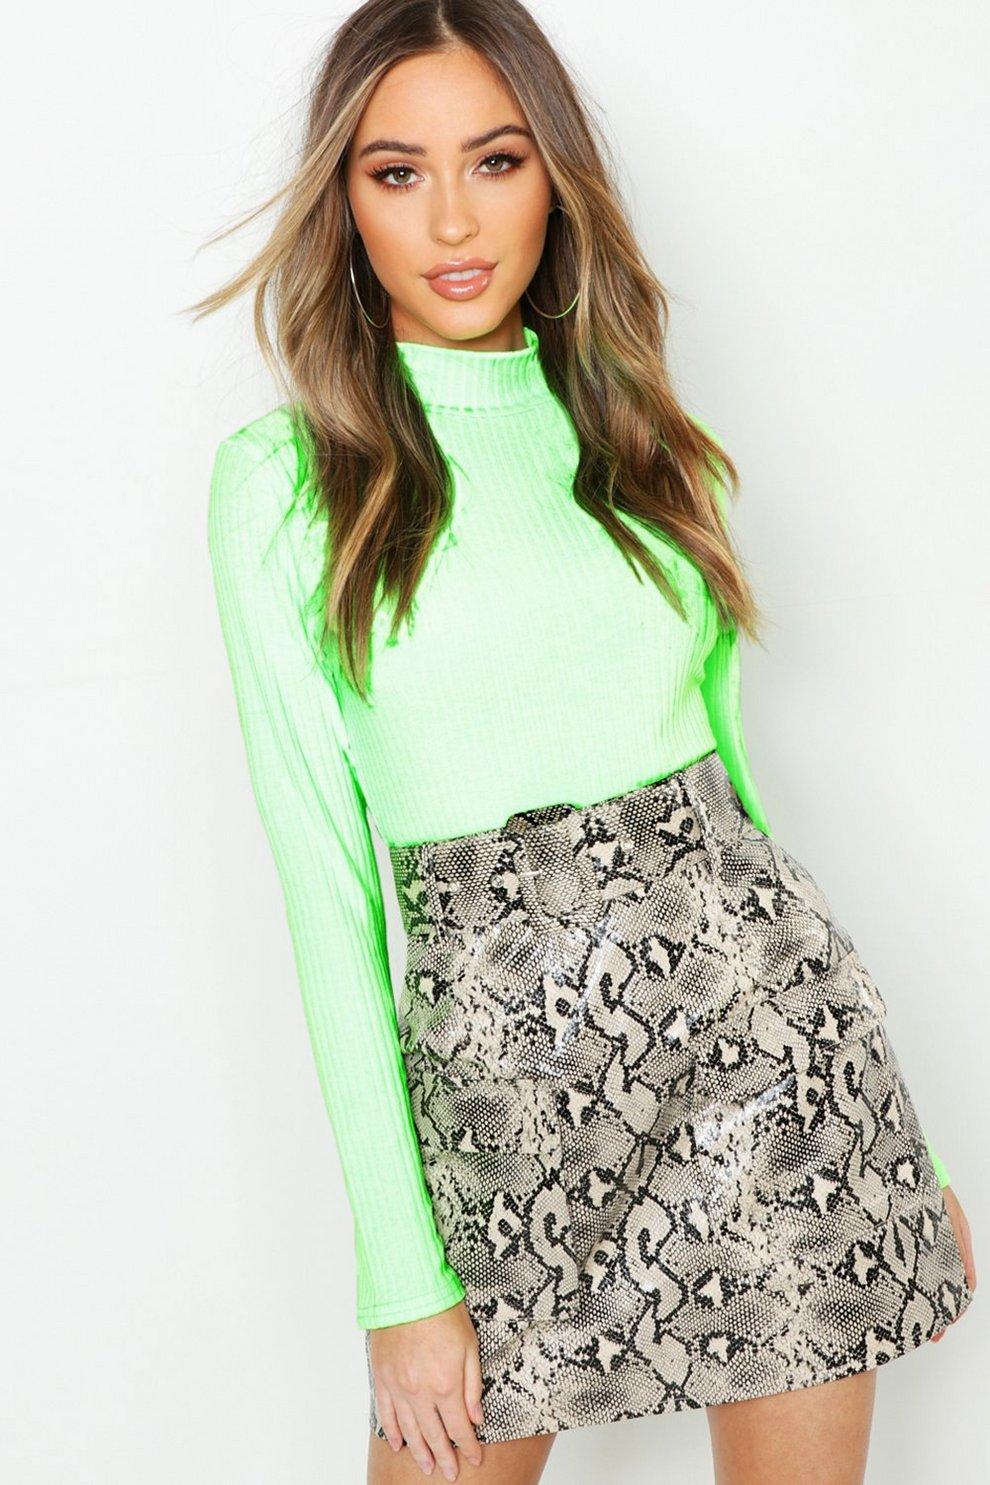 053baa6f85 Snake Print Leather Look Belted Cargo Mini Skirt | Boohoo